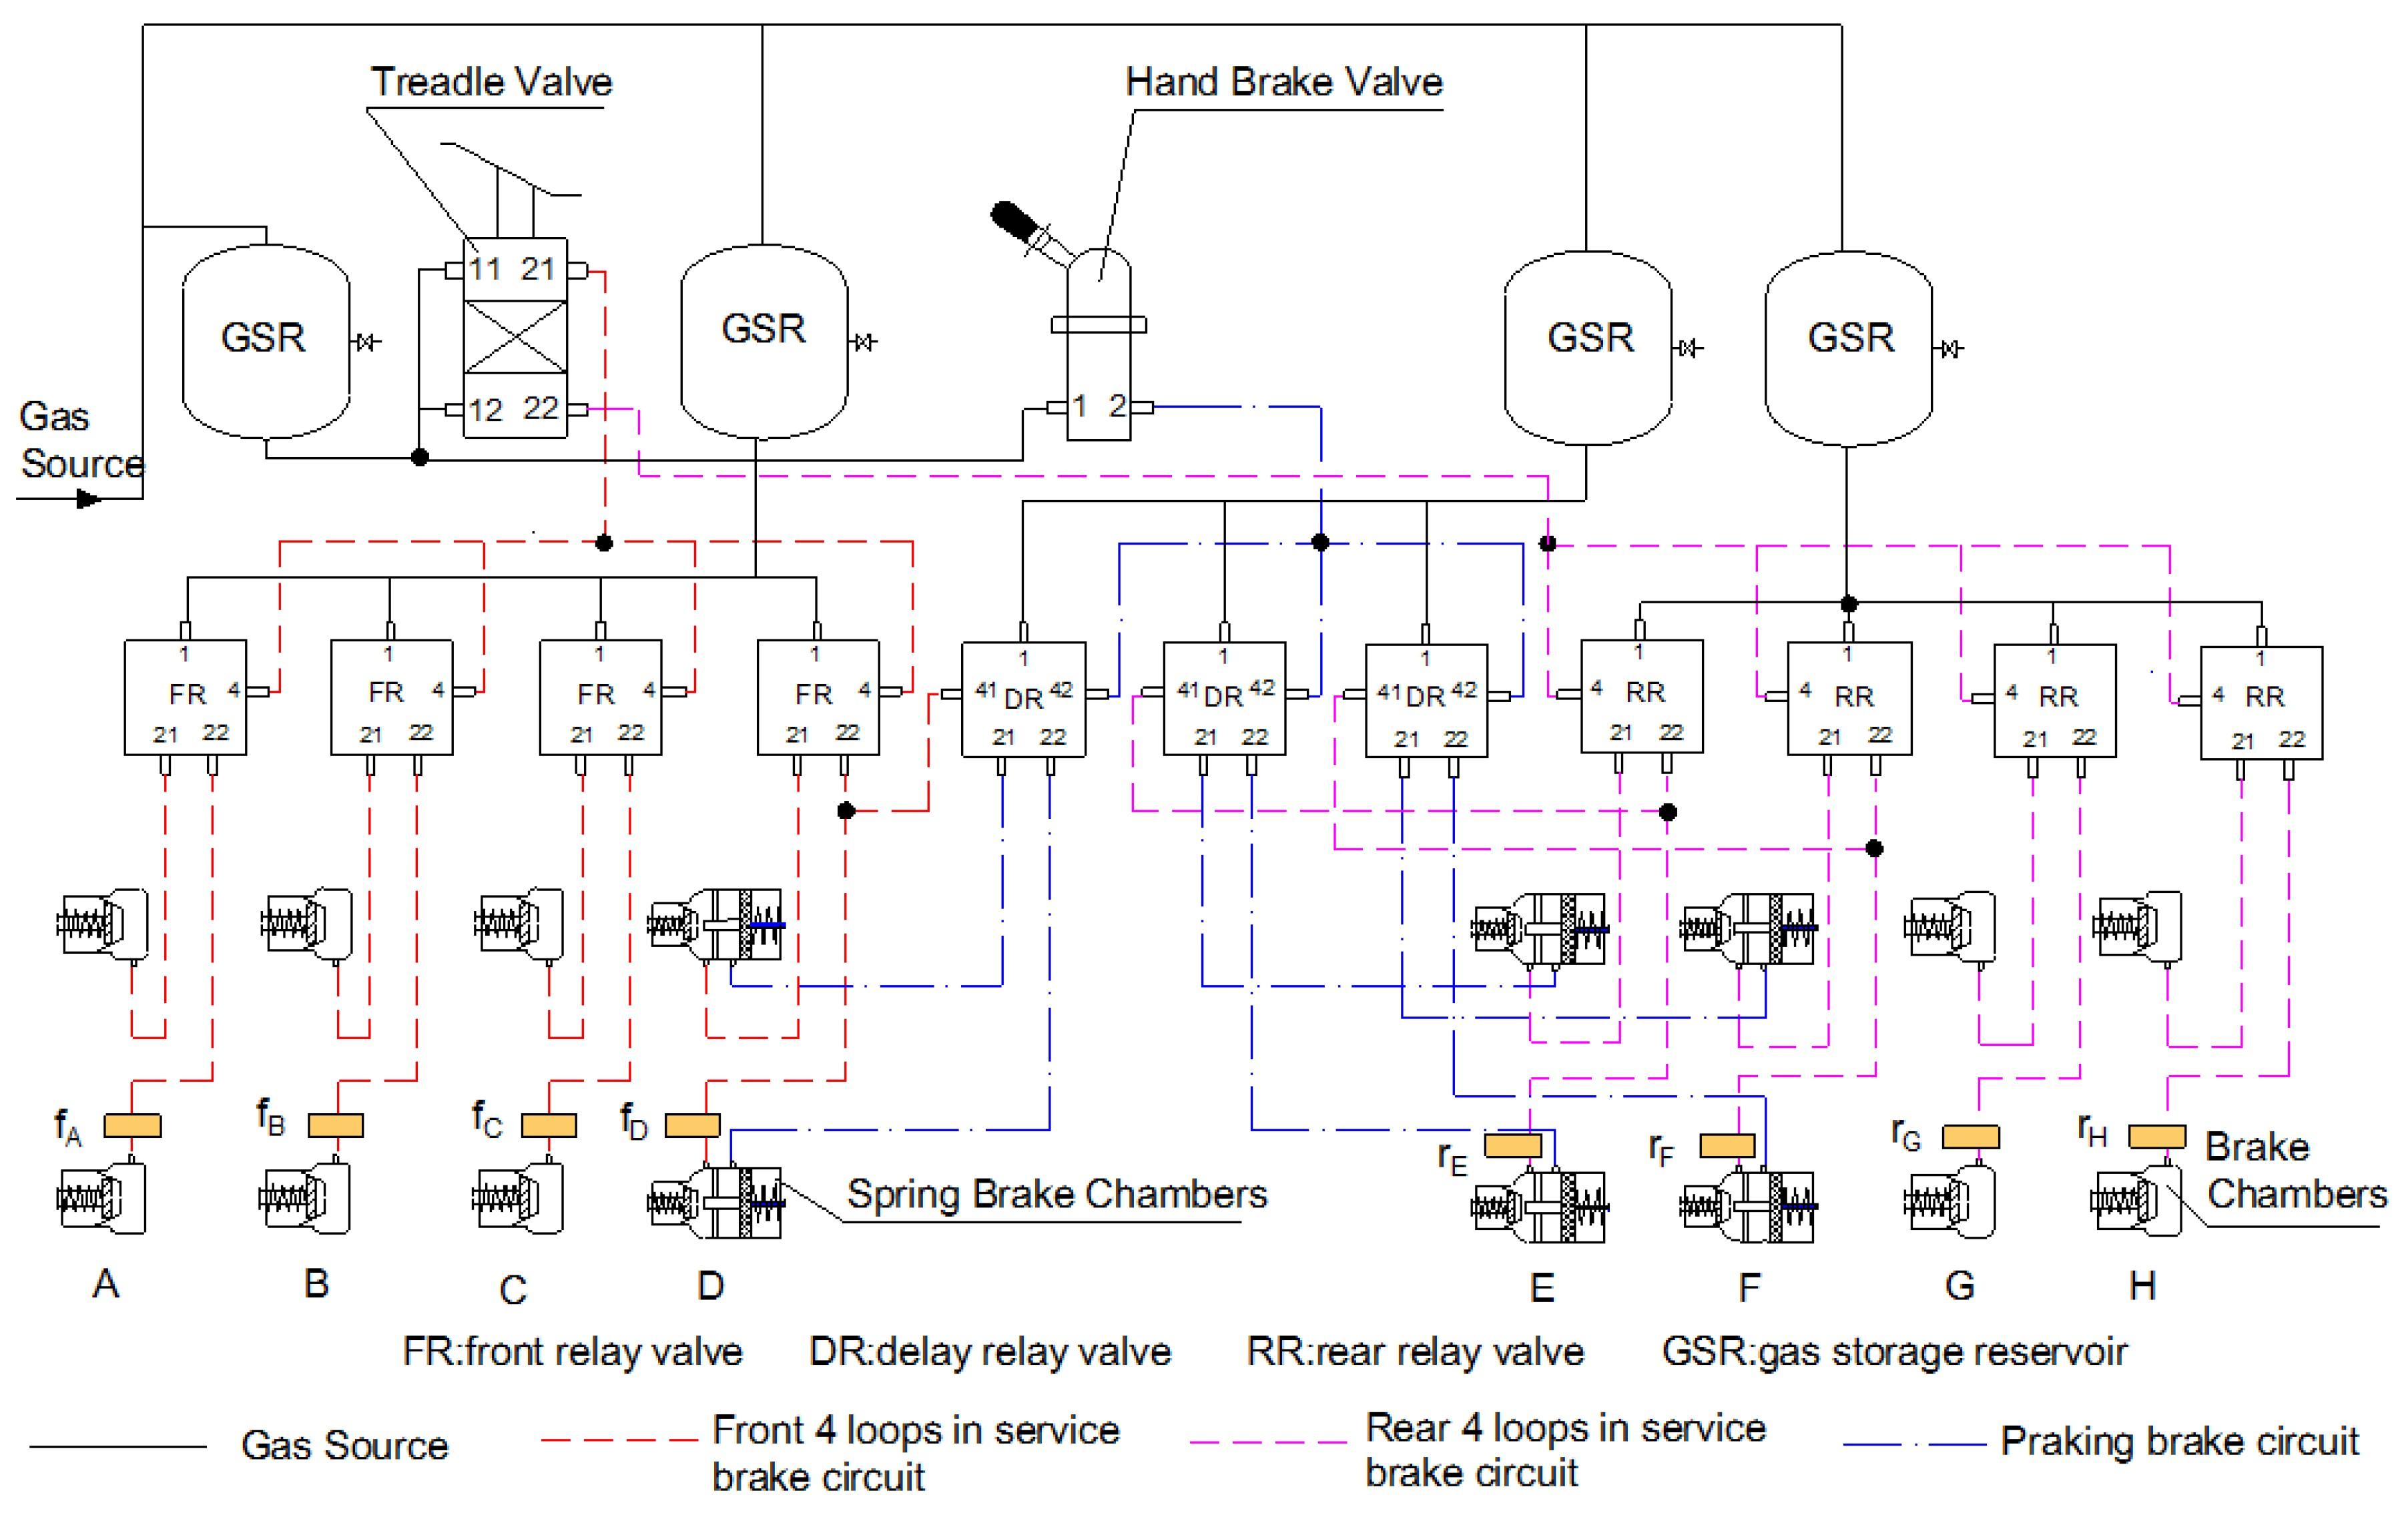 Air Brake System Diagram Applied Sciences Free Full Text Of Air Brake System Diagram